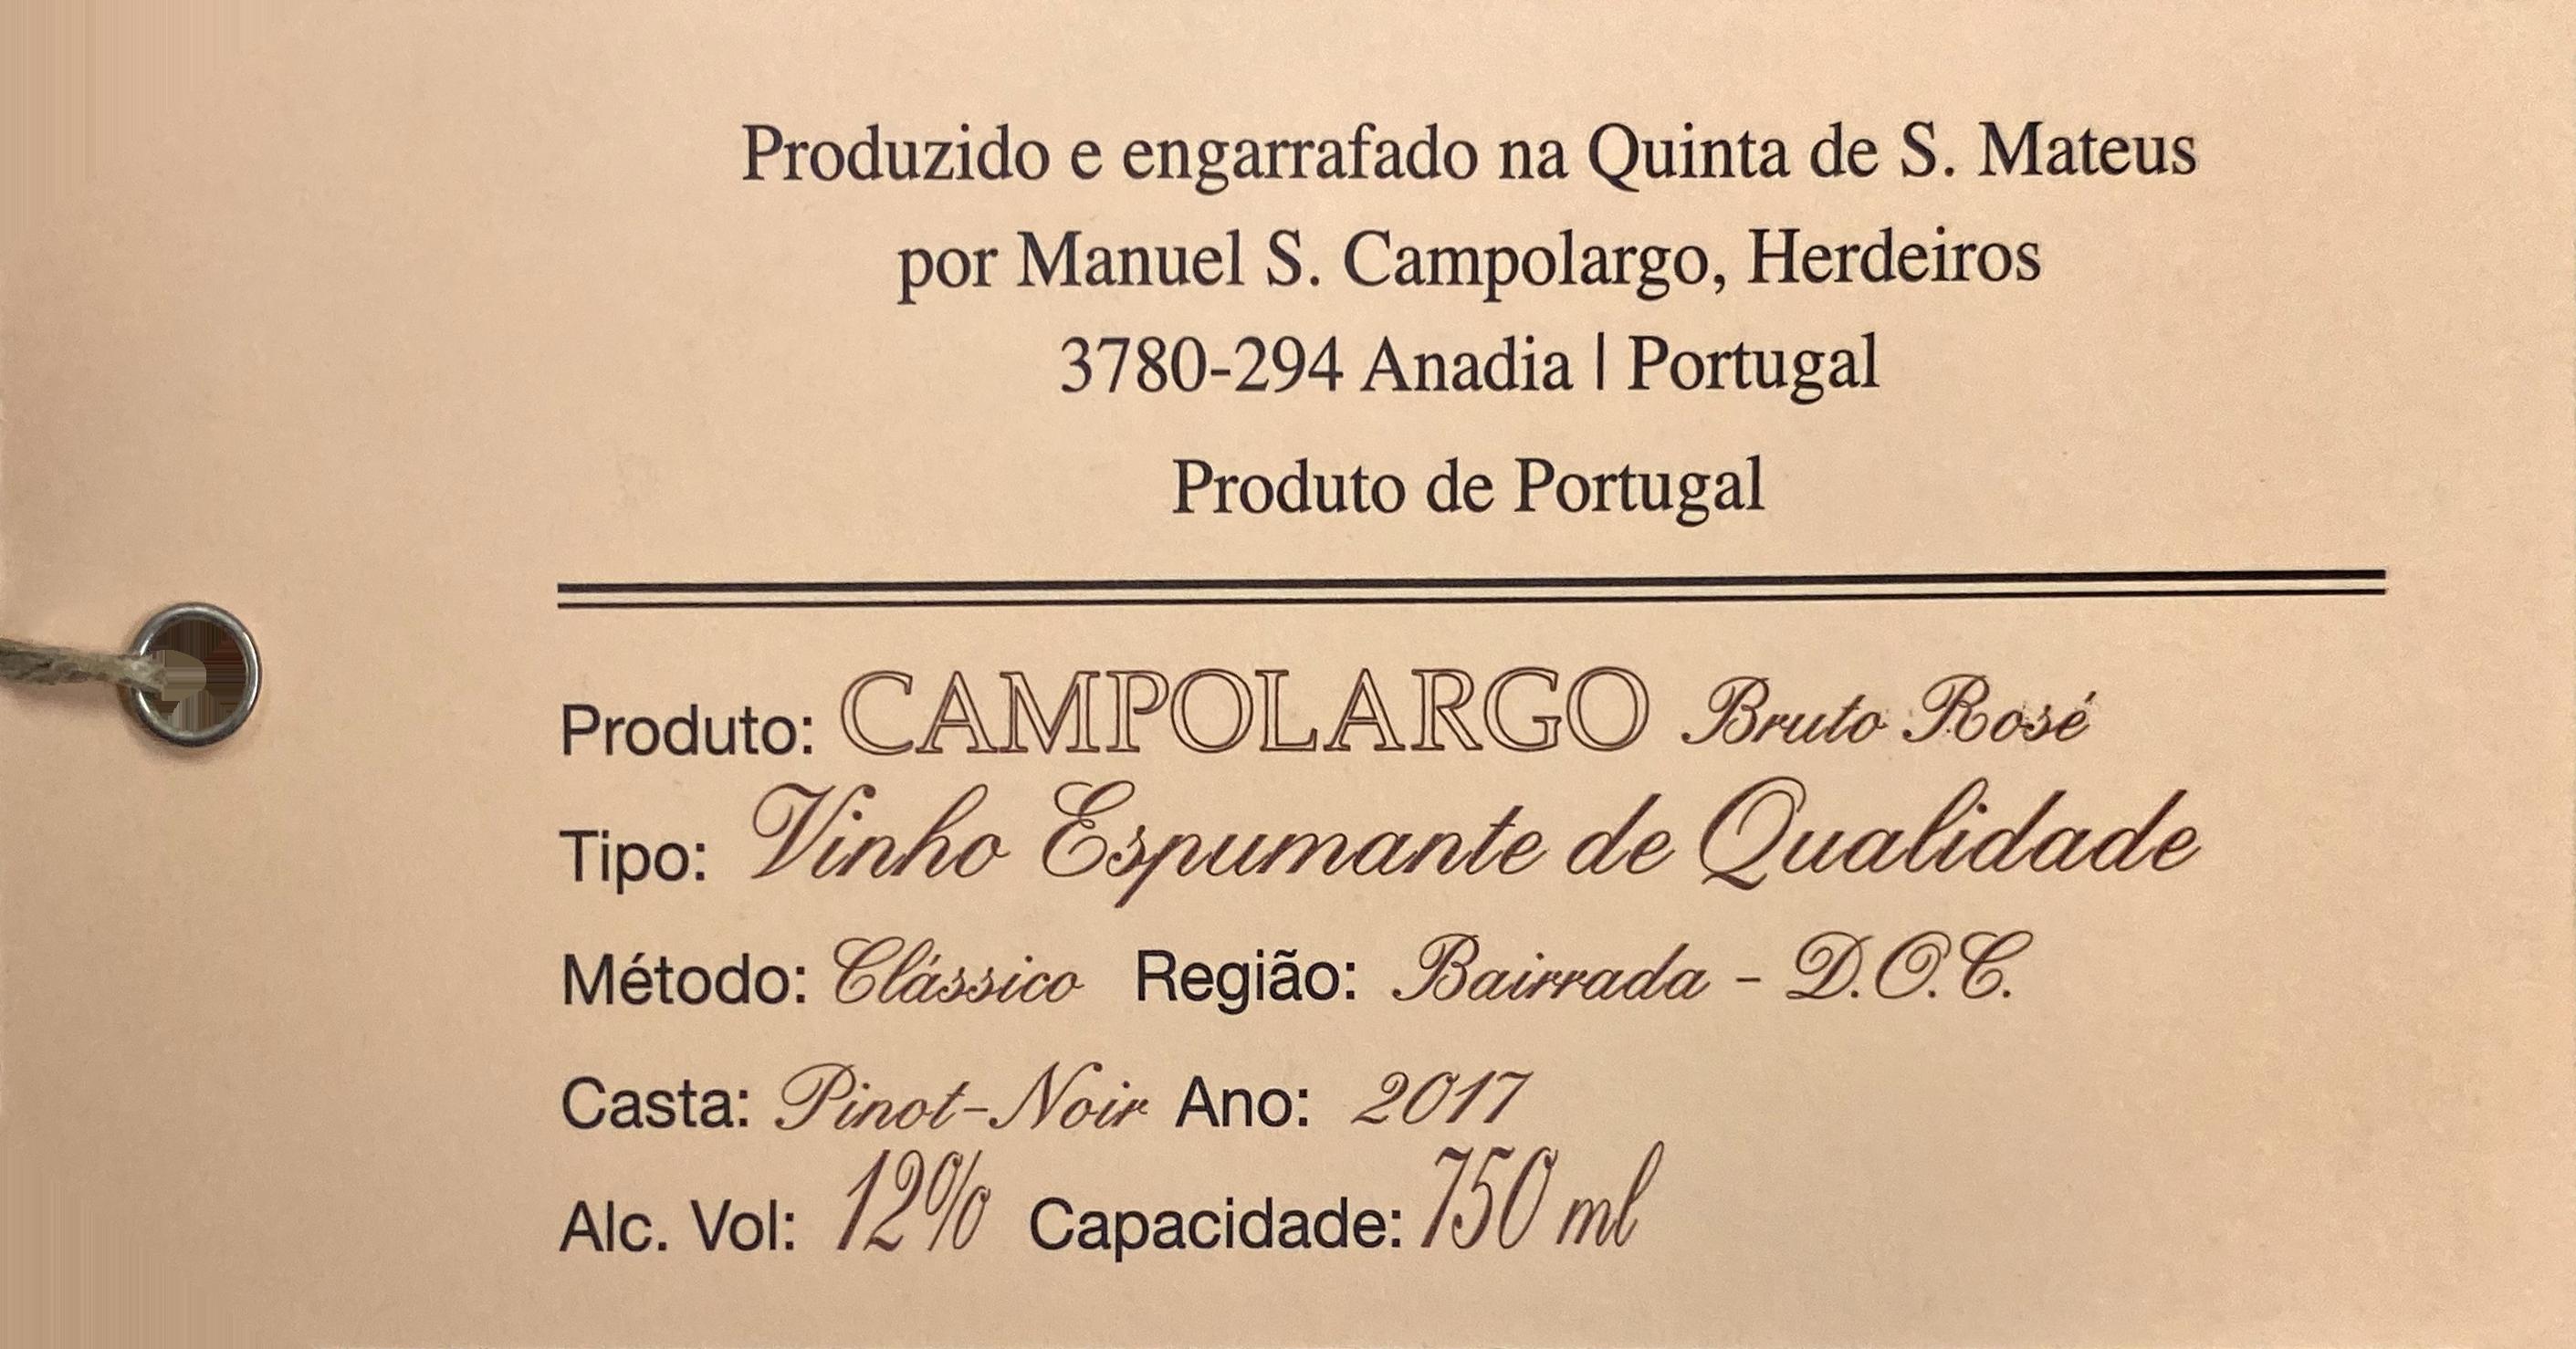 Campolargo Pinot Noir Sparkling Rose 2017